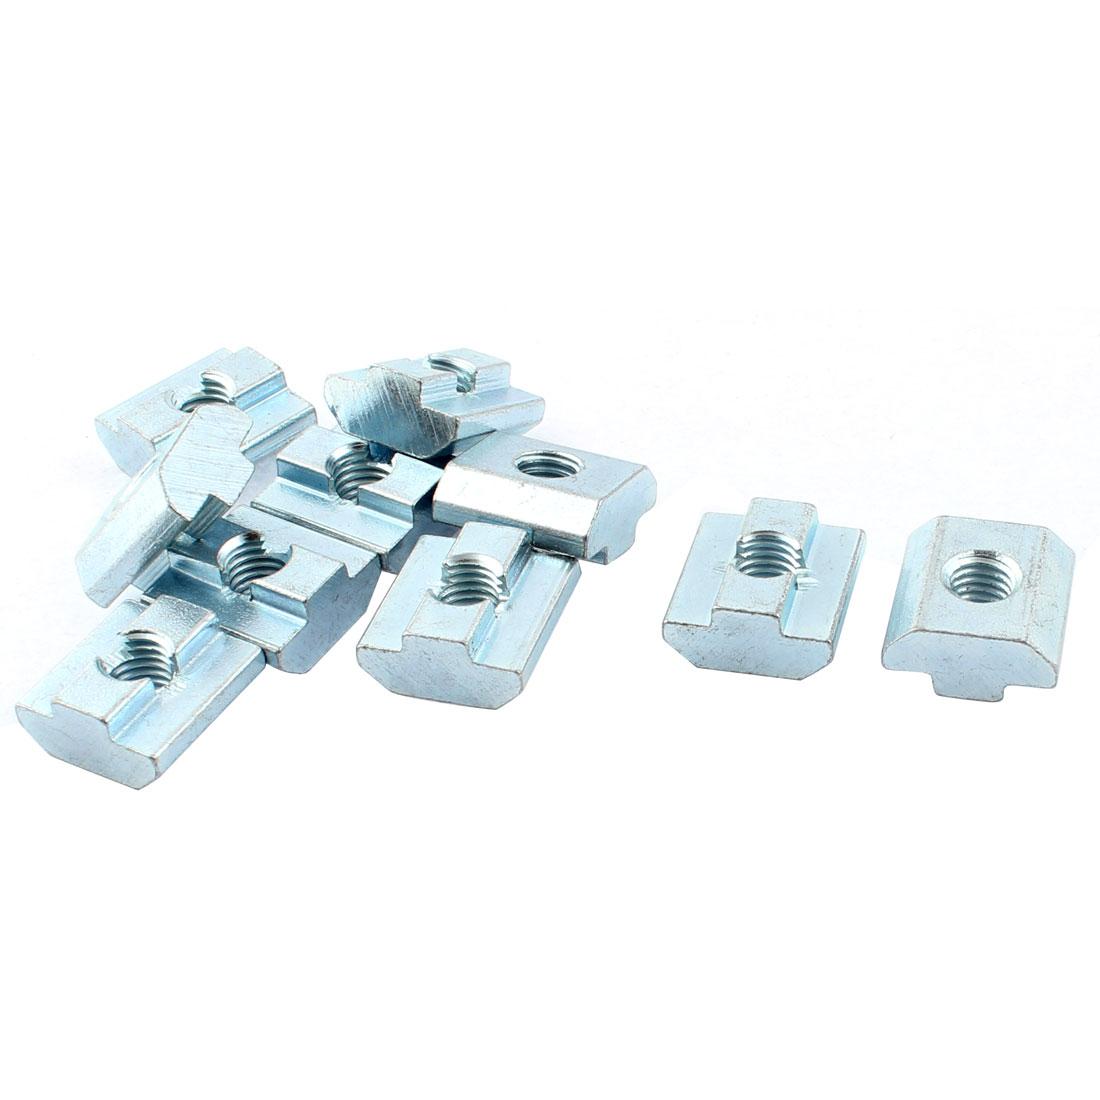 M8 Female Thread 40 Series Slide in Metal T-slot Nut Silver Tone 10pcs